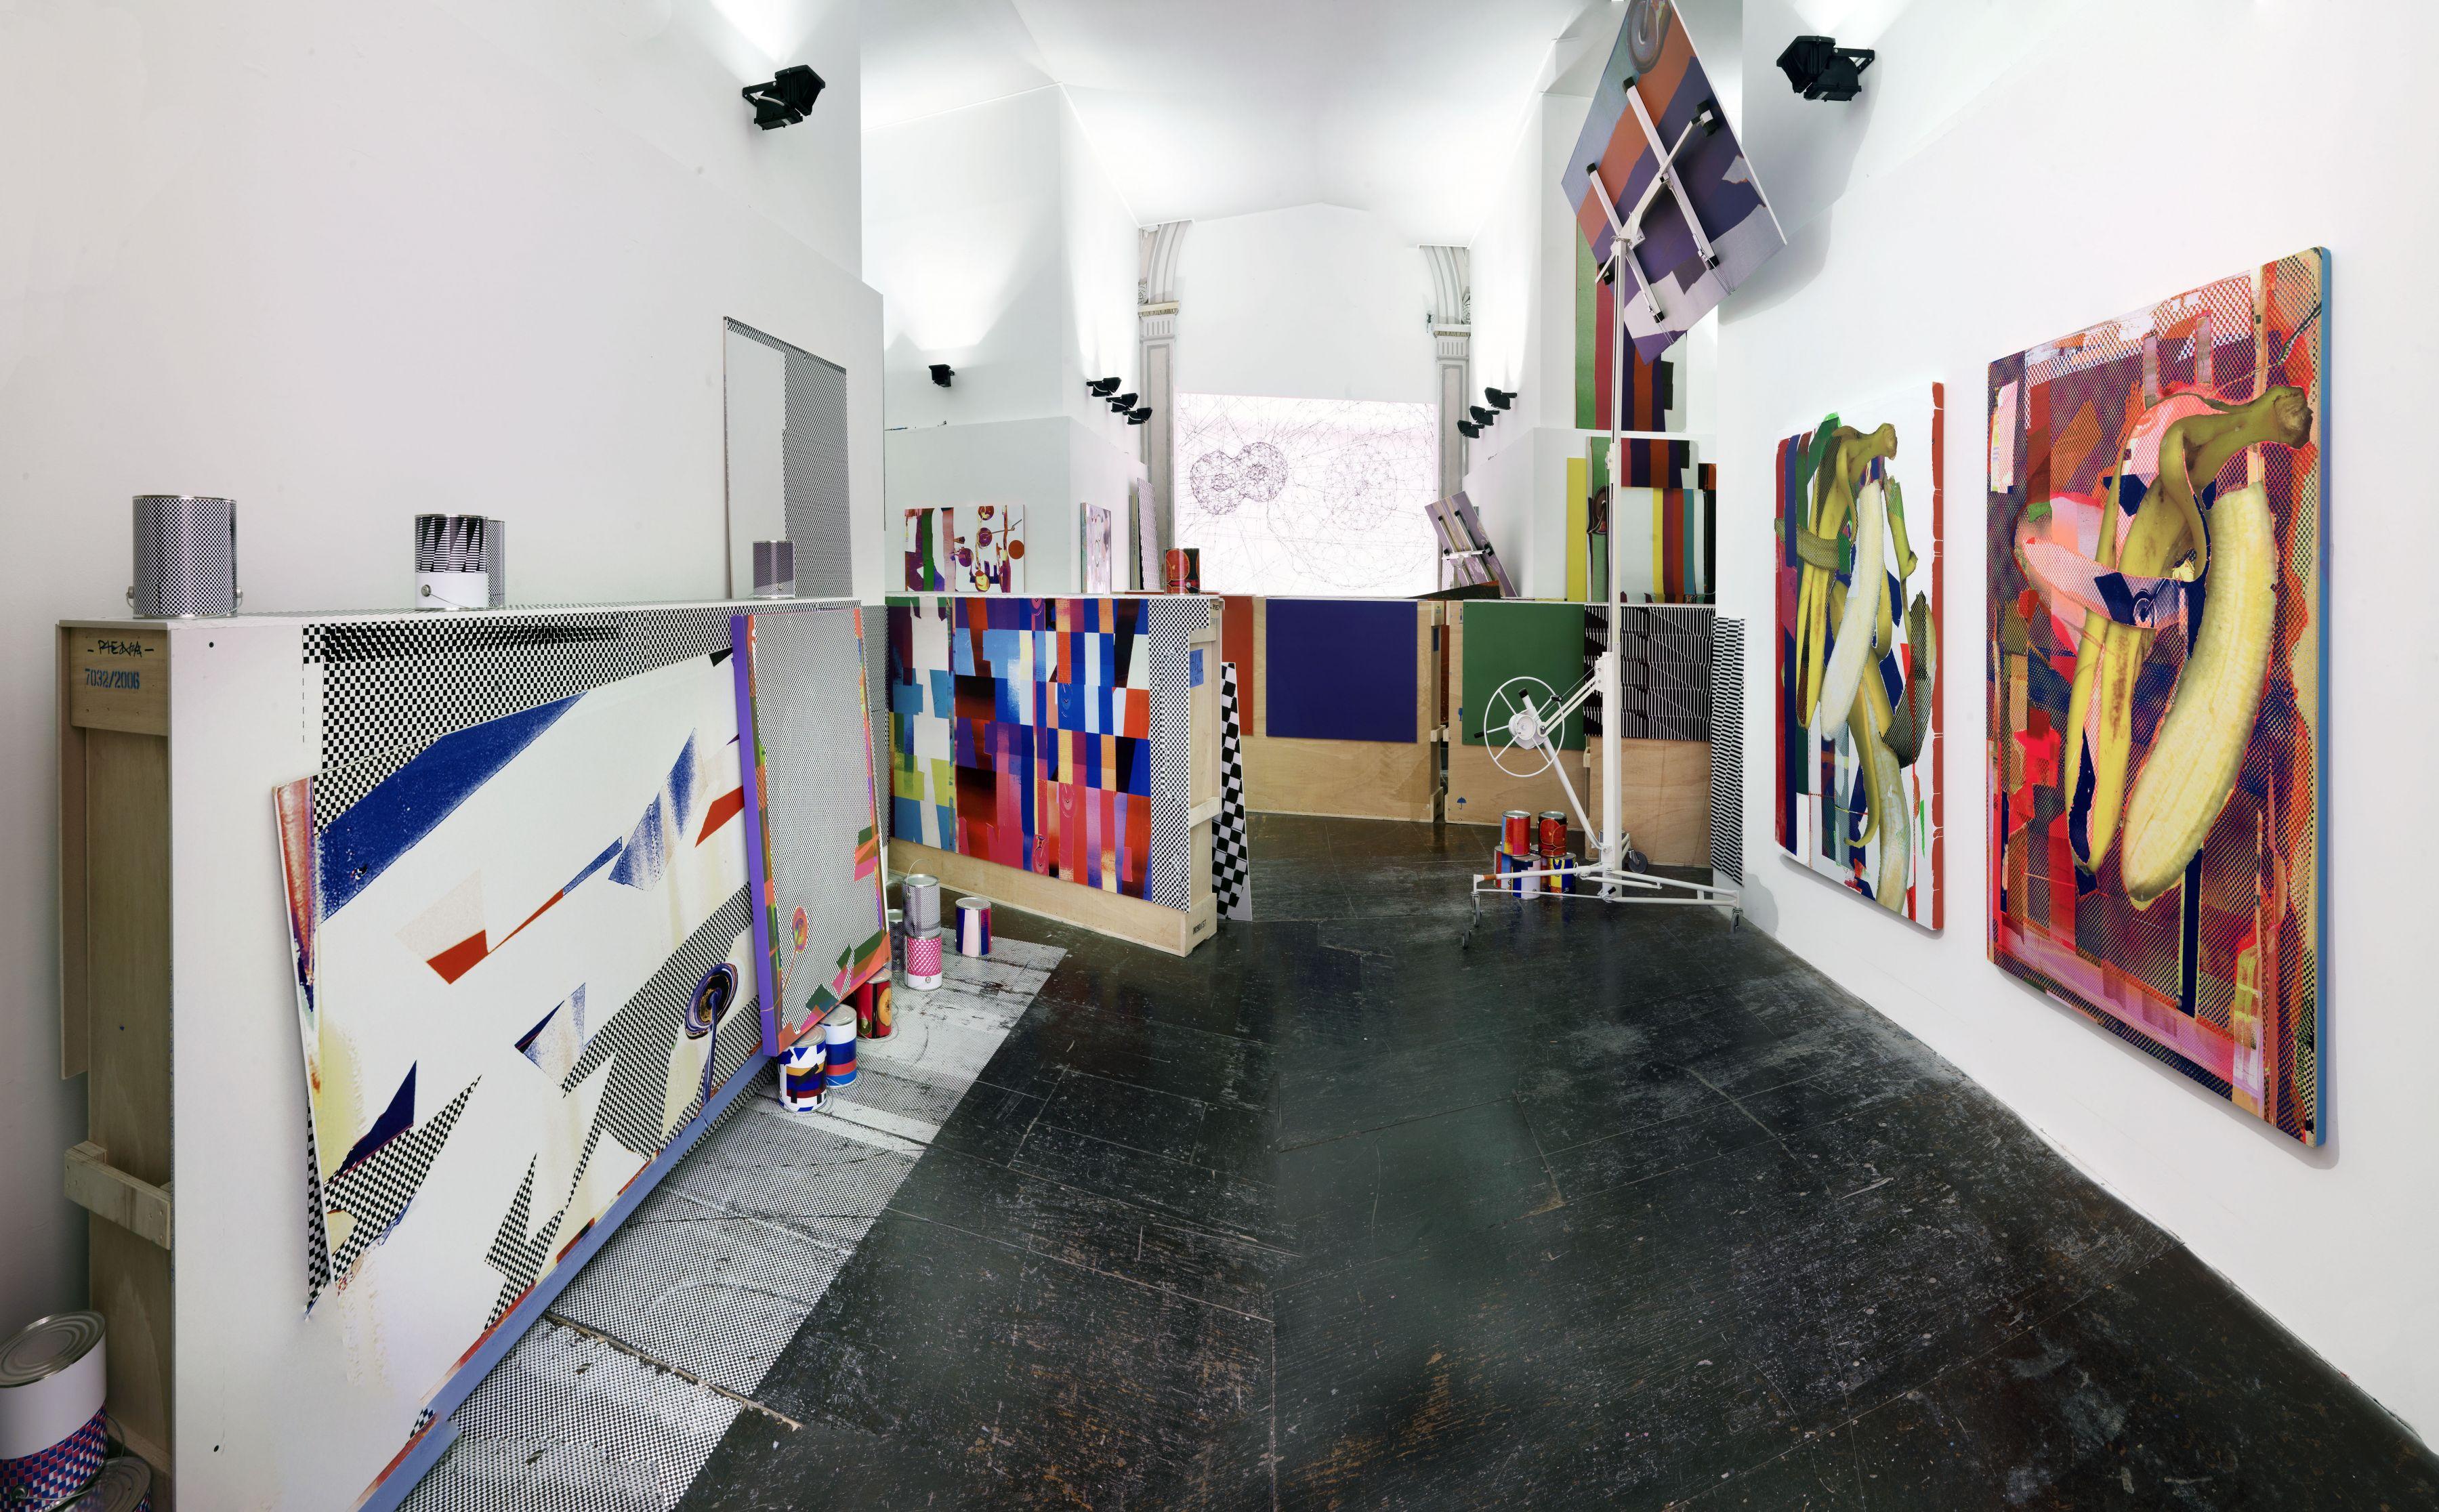 Installation view, Making Worlds, 53rd Venice Biennale, Venice, 2009